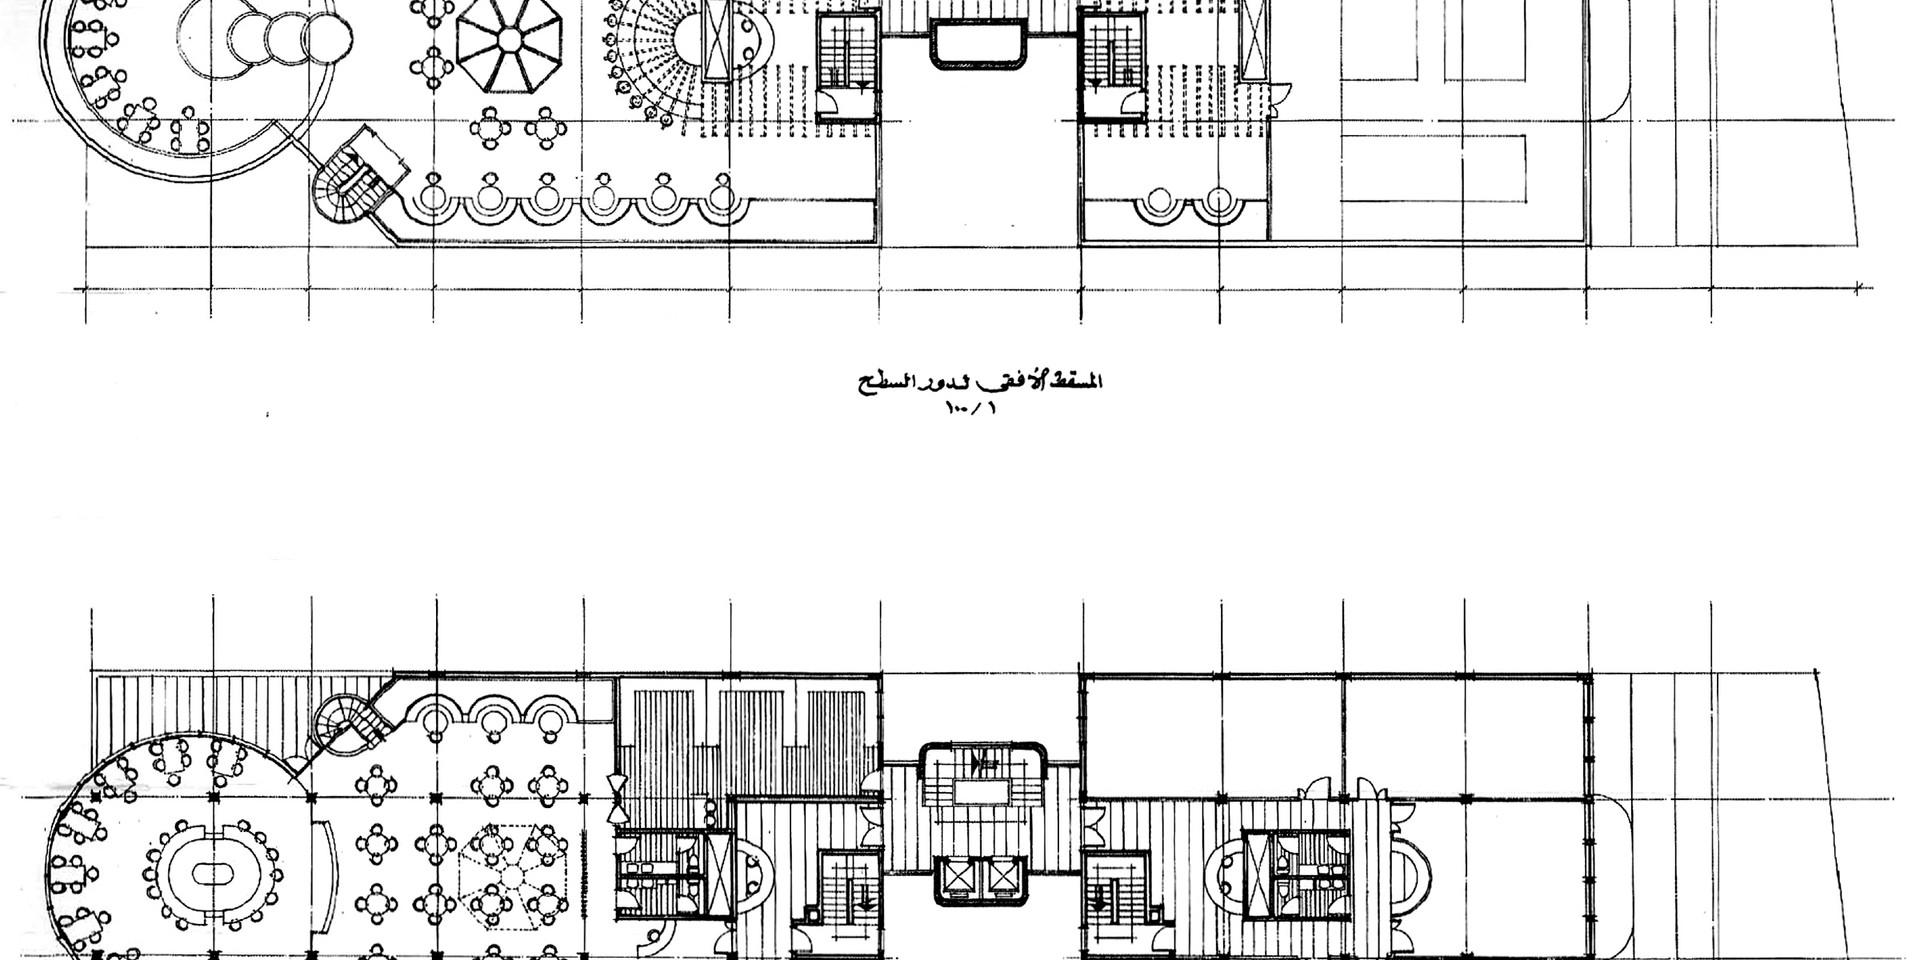 Central Bank of Egypt Rowd el Farag Office Building Penthouse & RFloor Plans